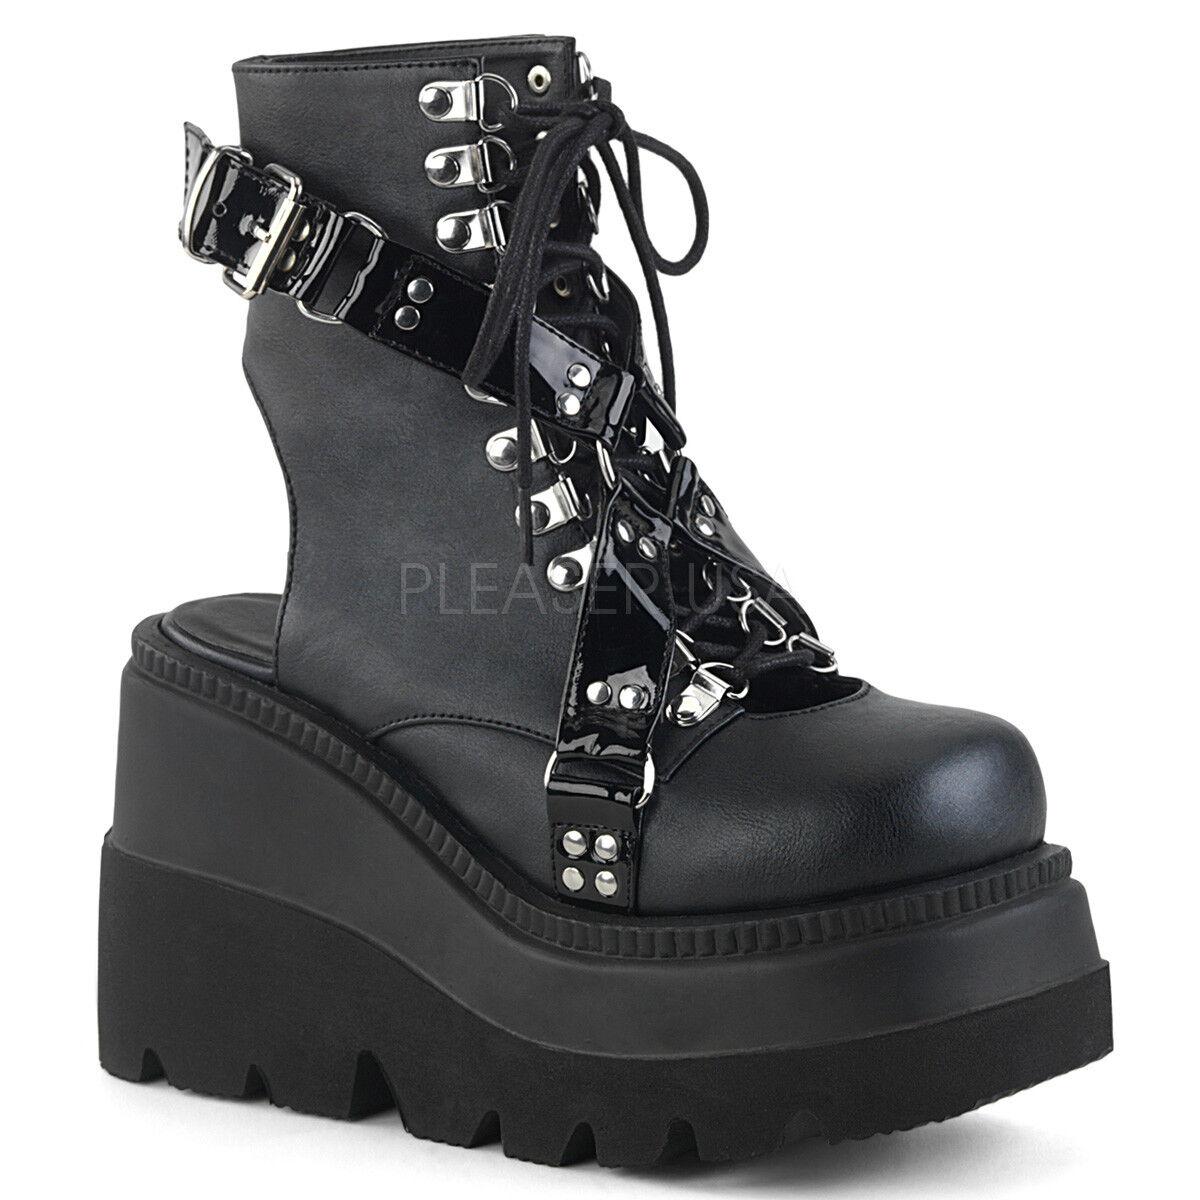 Demonia SHAKER-56 SHAKER-56 SHAKER-56 Women's Wedge Platform Open Back Lace-up Ankle Boot 9dd9d5